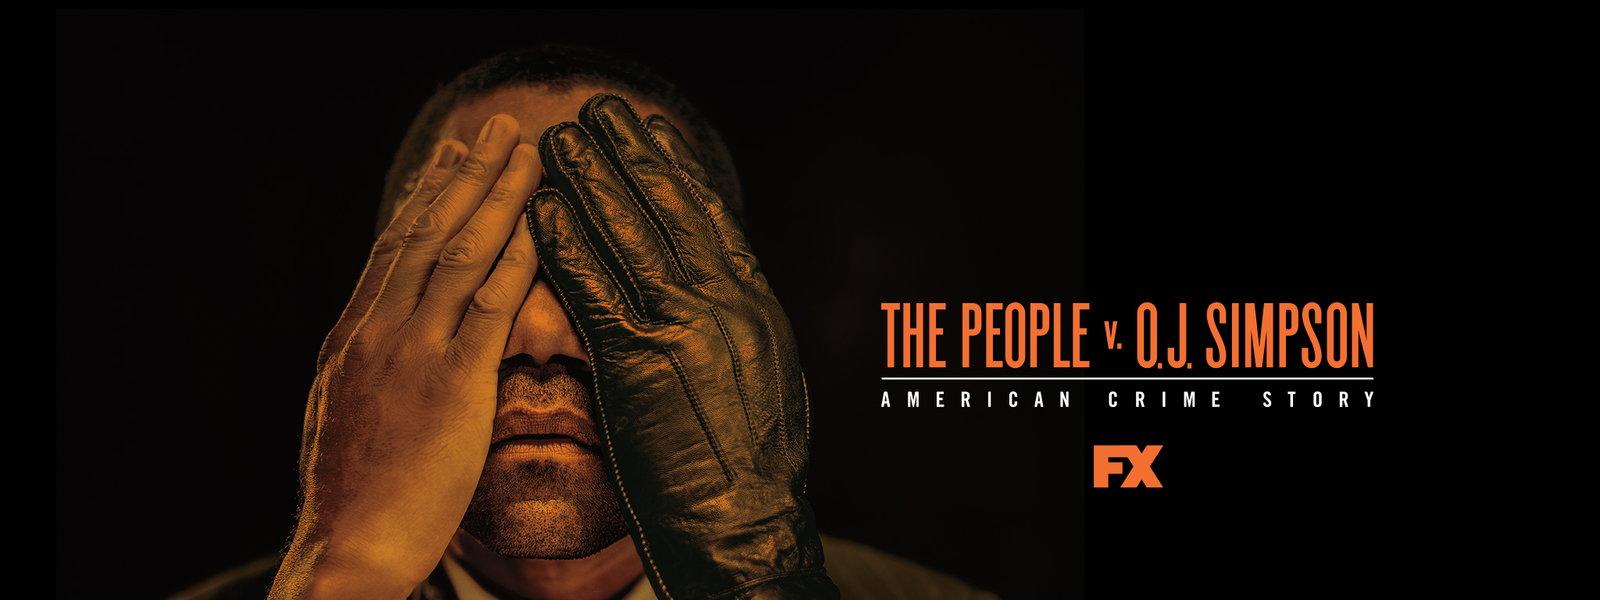 The People vs O.J. Simpson: American Crime Story